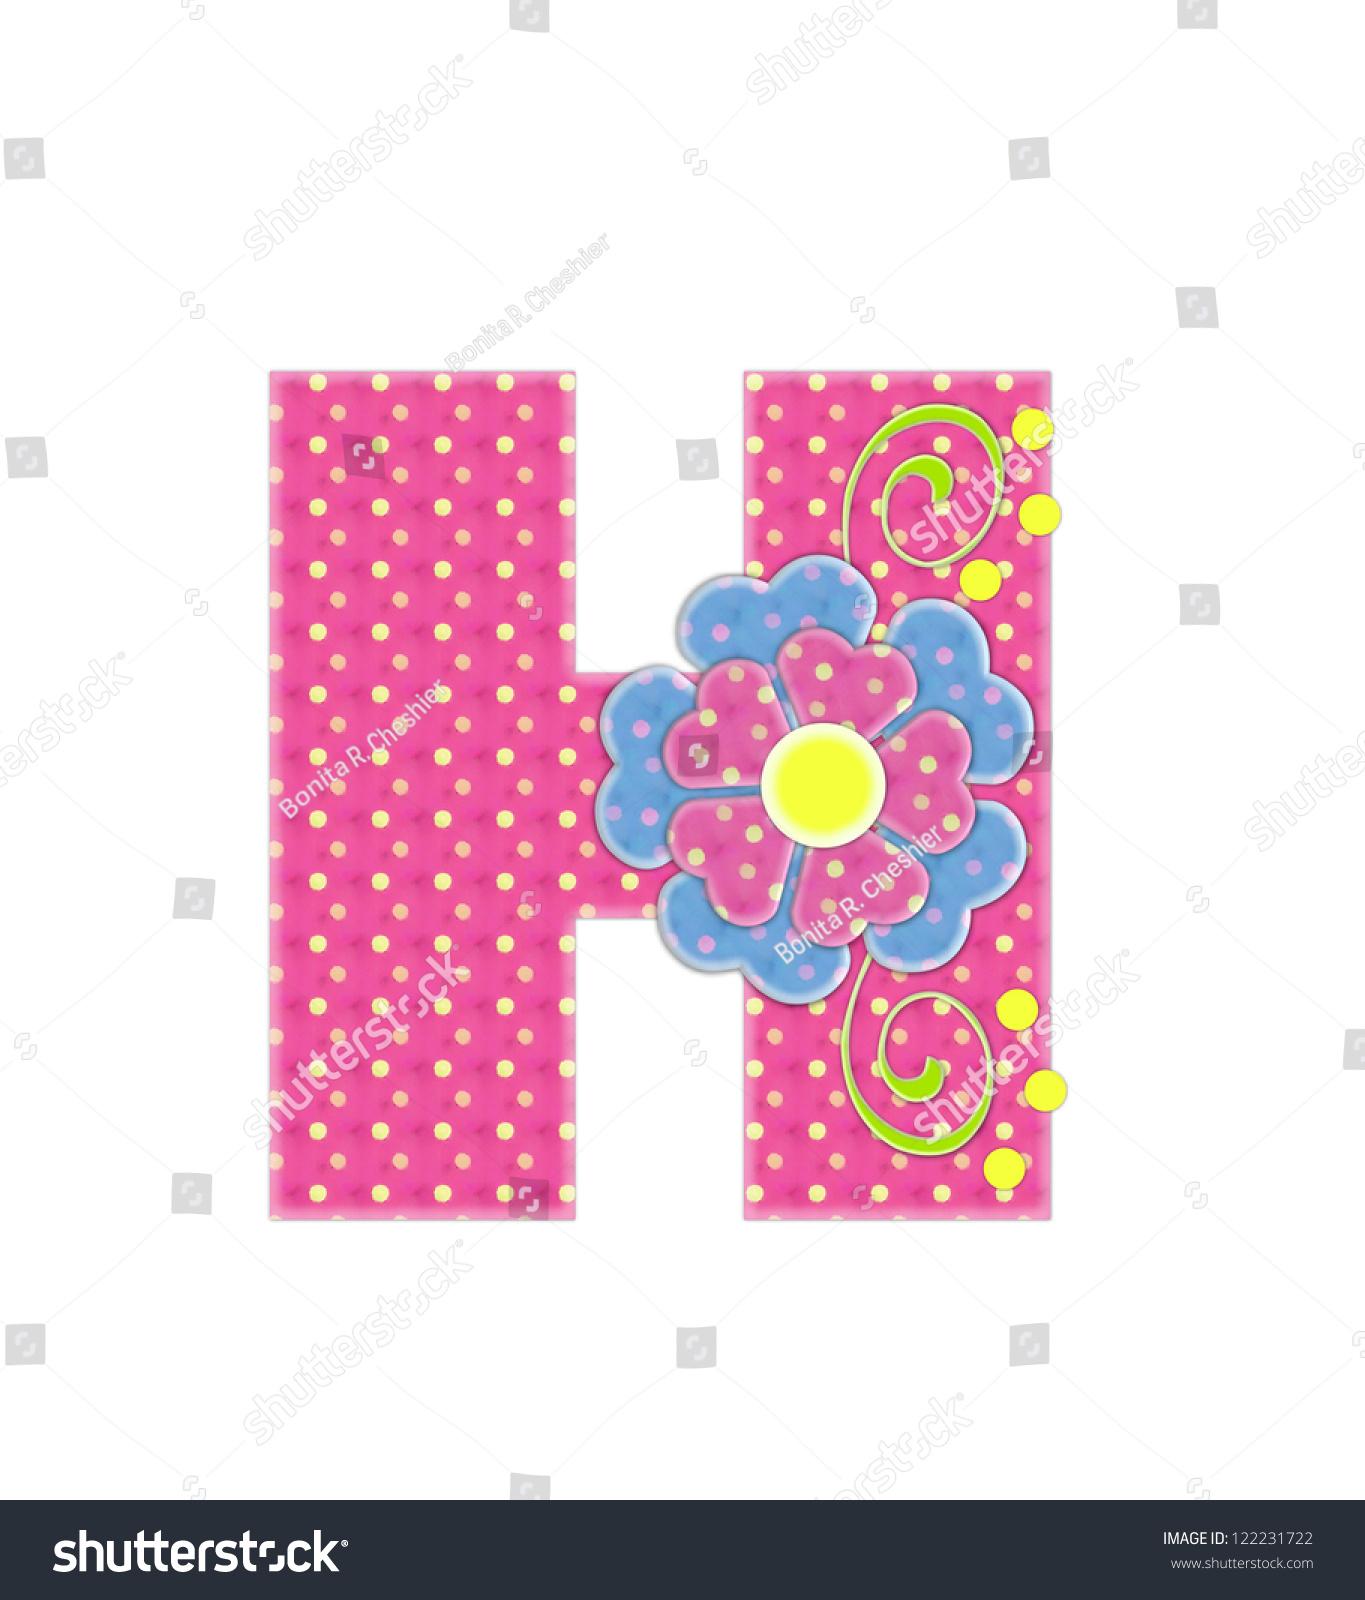 Royalty Free Stock Illustration of Letter H Alphabet Set Bonita Pink ...